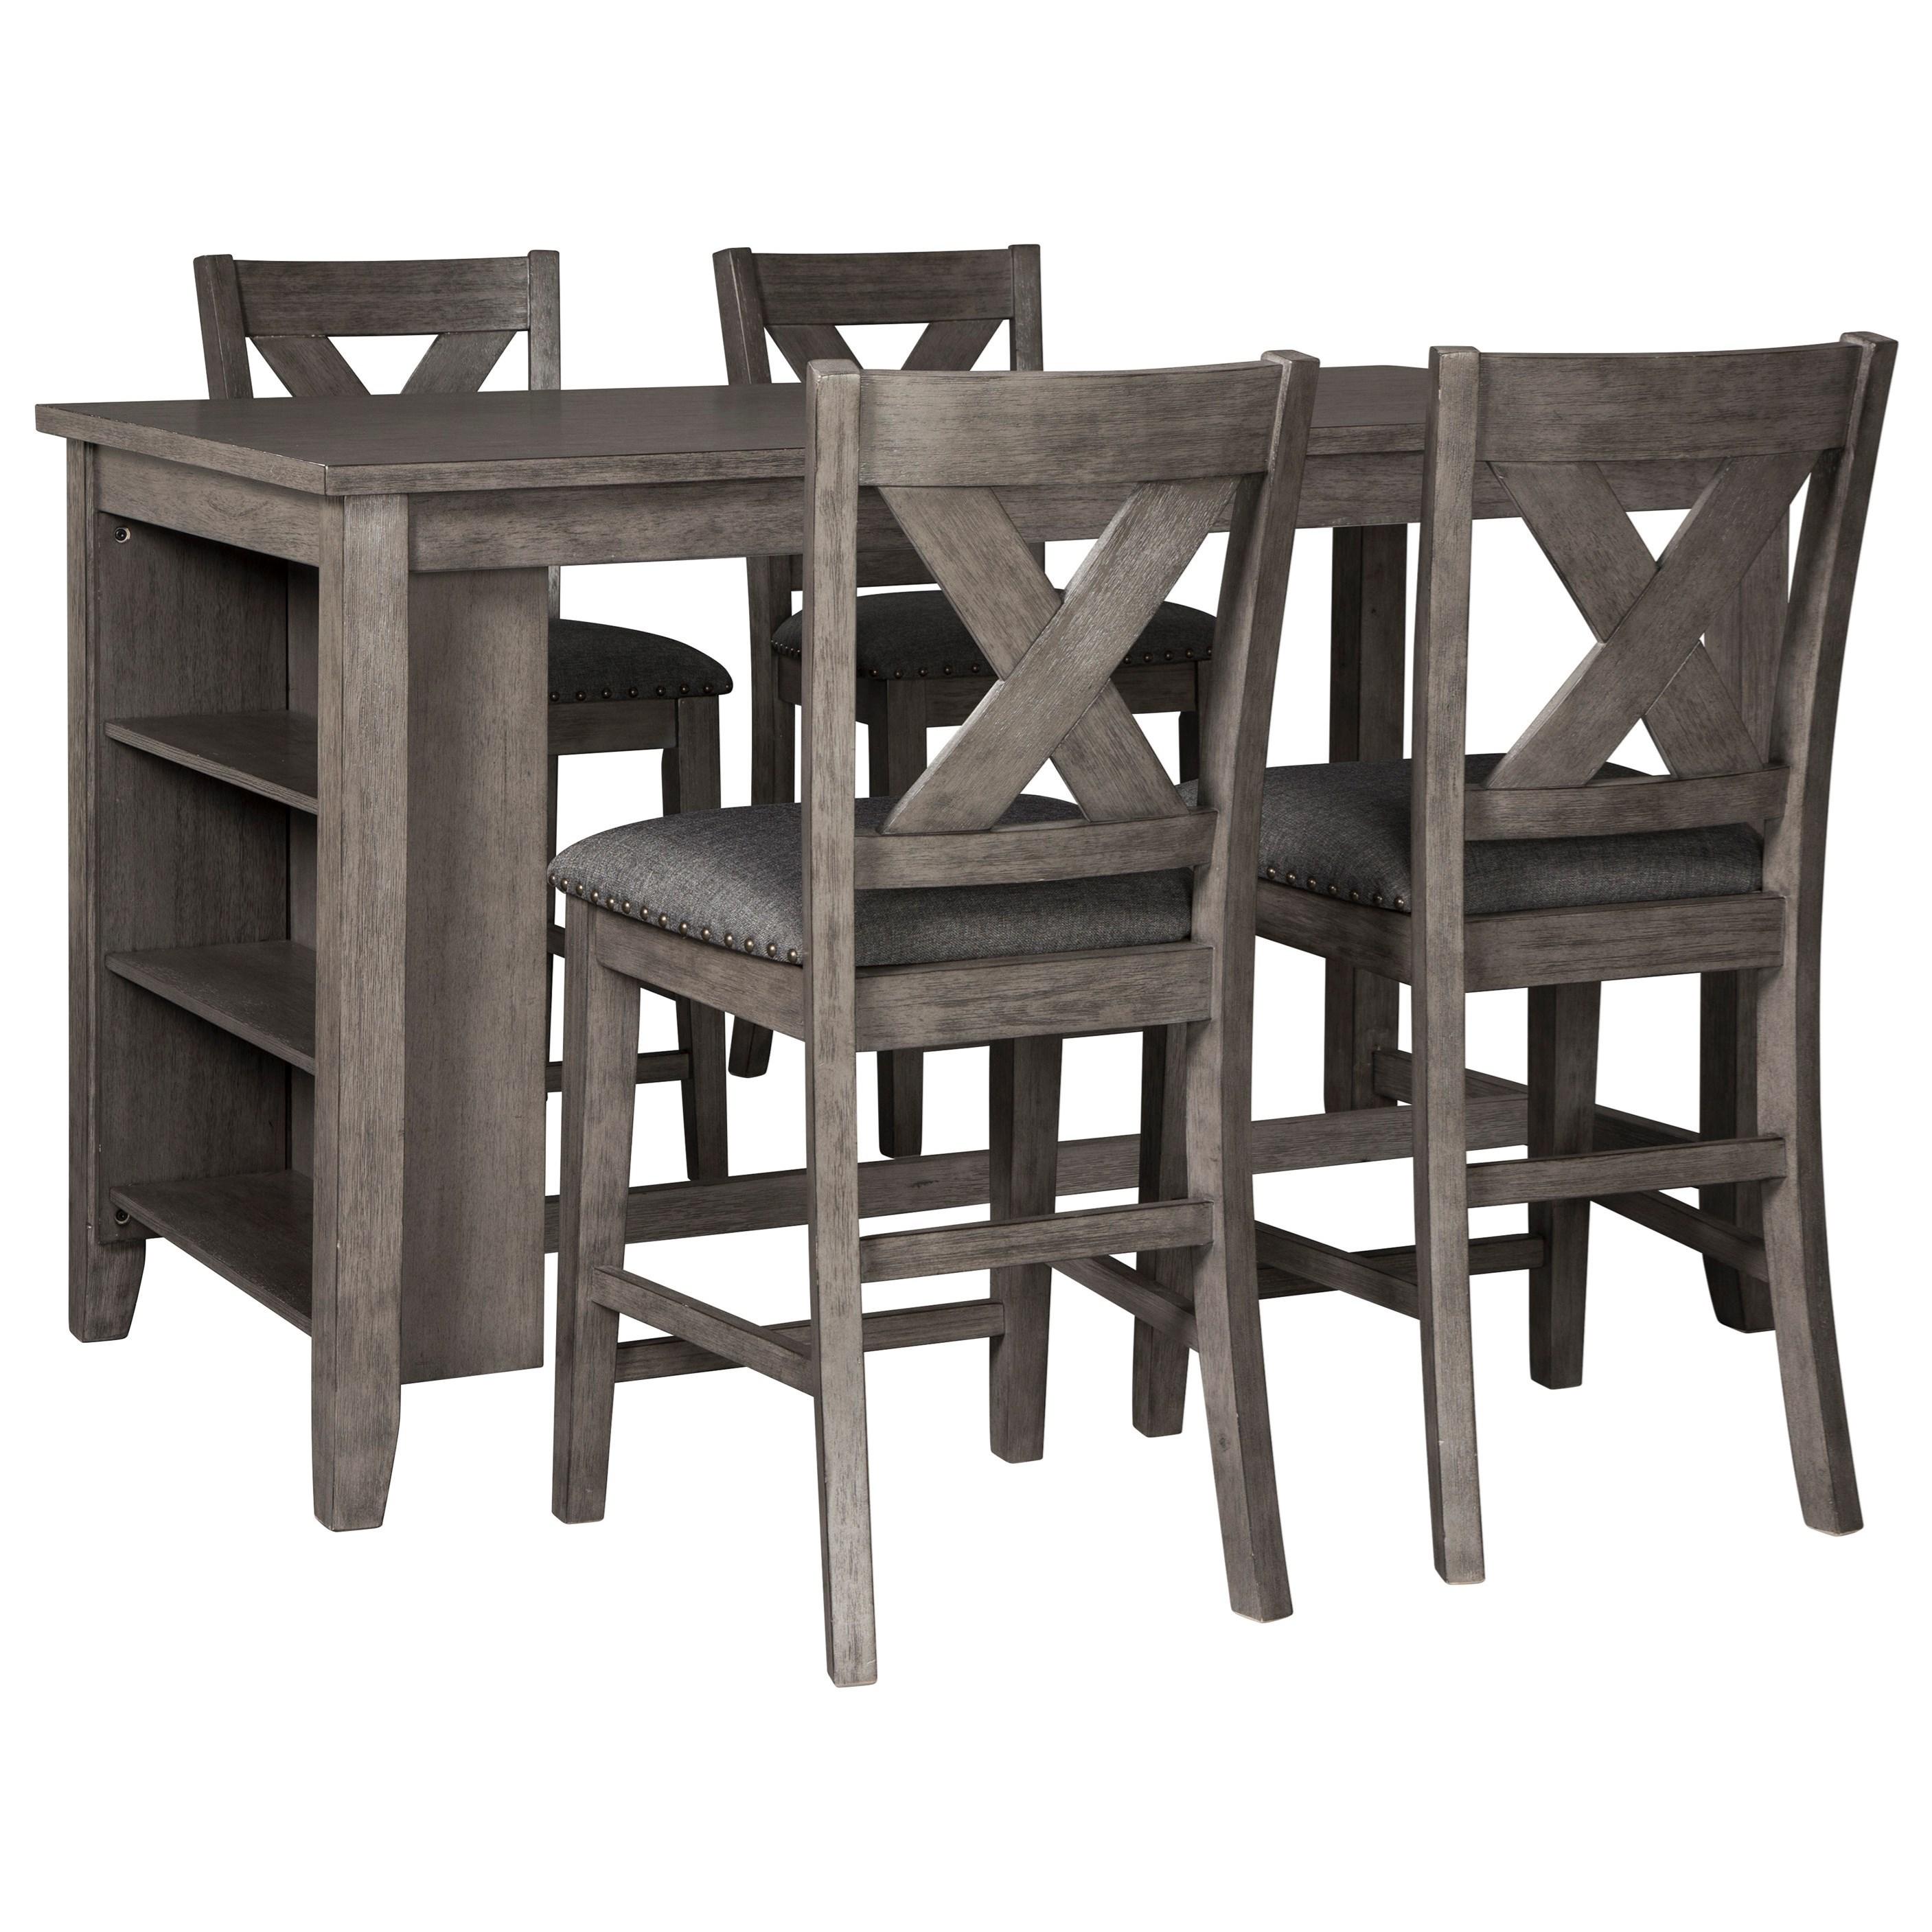 Exceptionnel Signature Design By Ashley CaitbrookFive Piece Kitchen Island U0026 Chair Set  ...